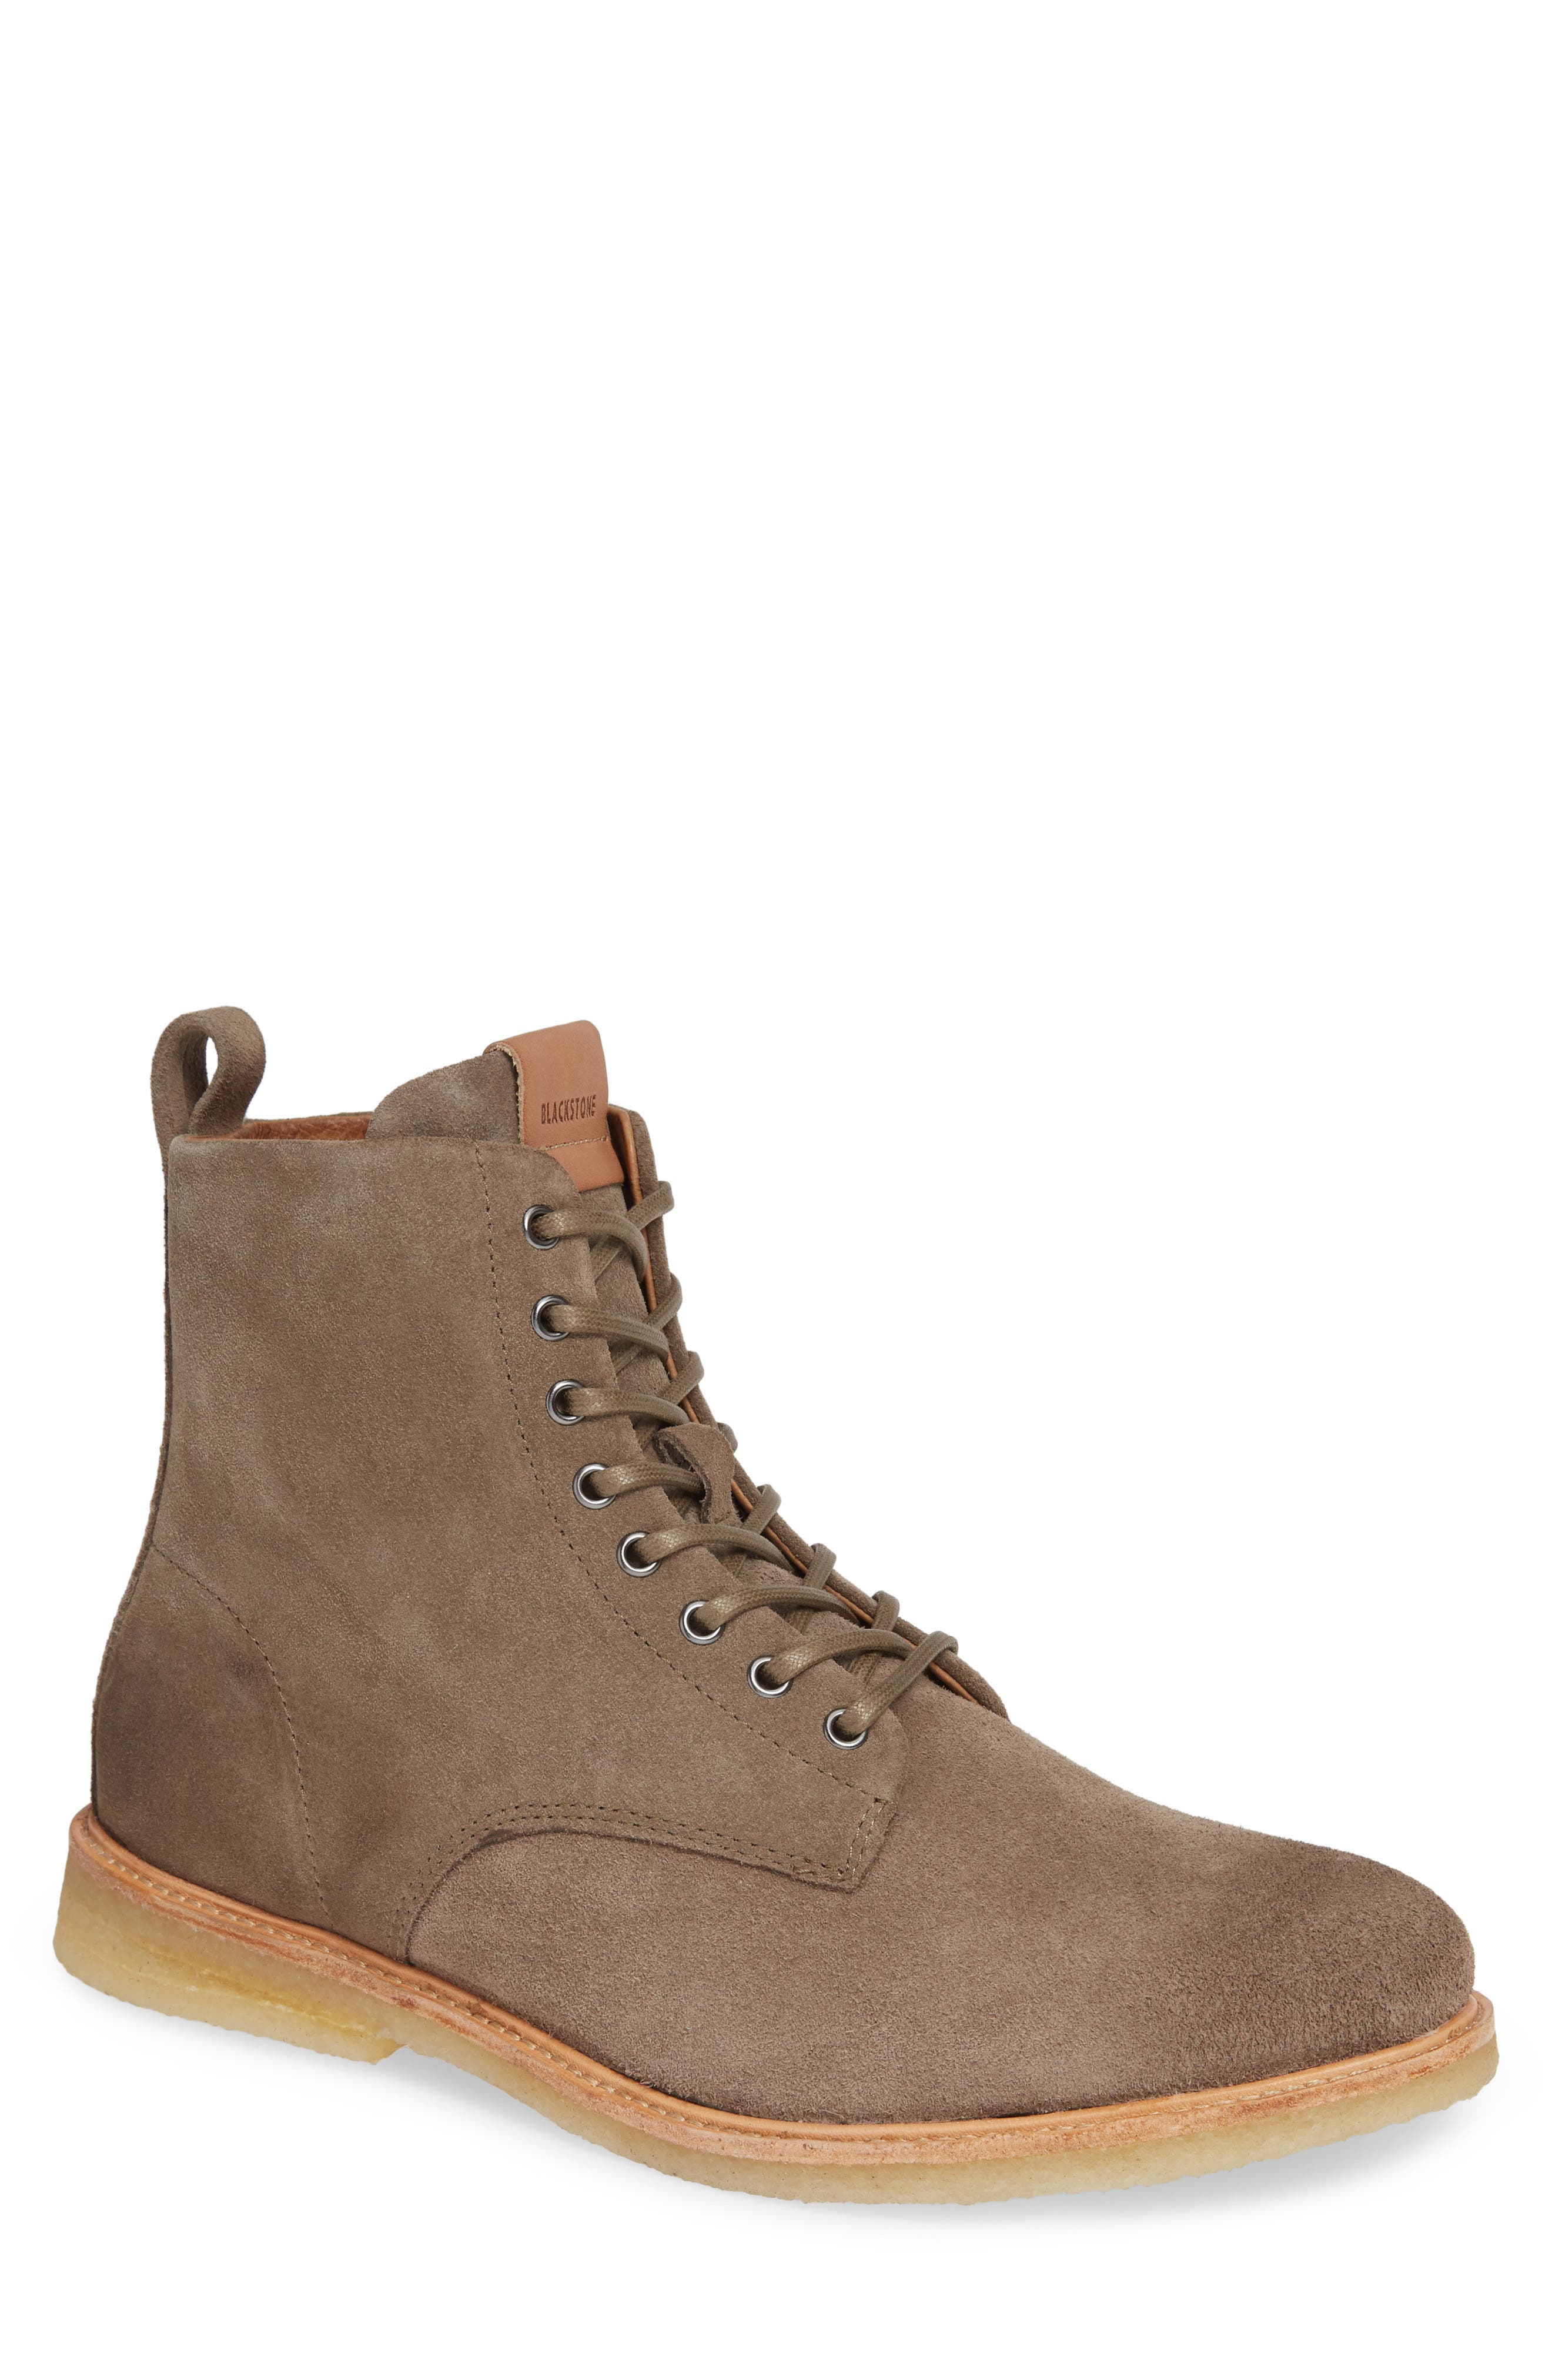 QM23 Plain Toe Boot,                         Main,                         color, GREY